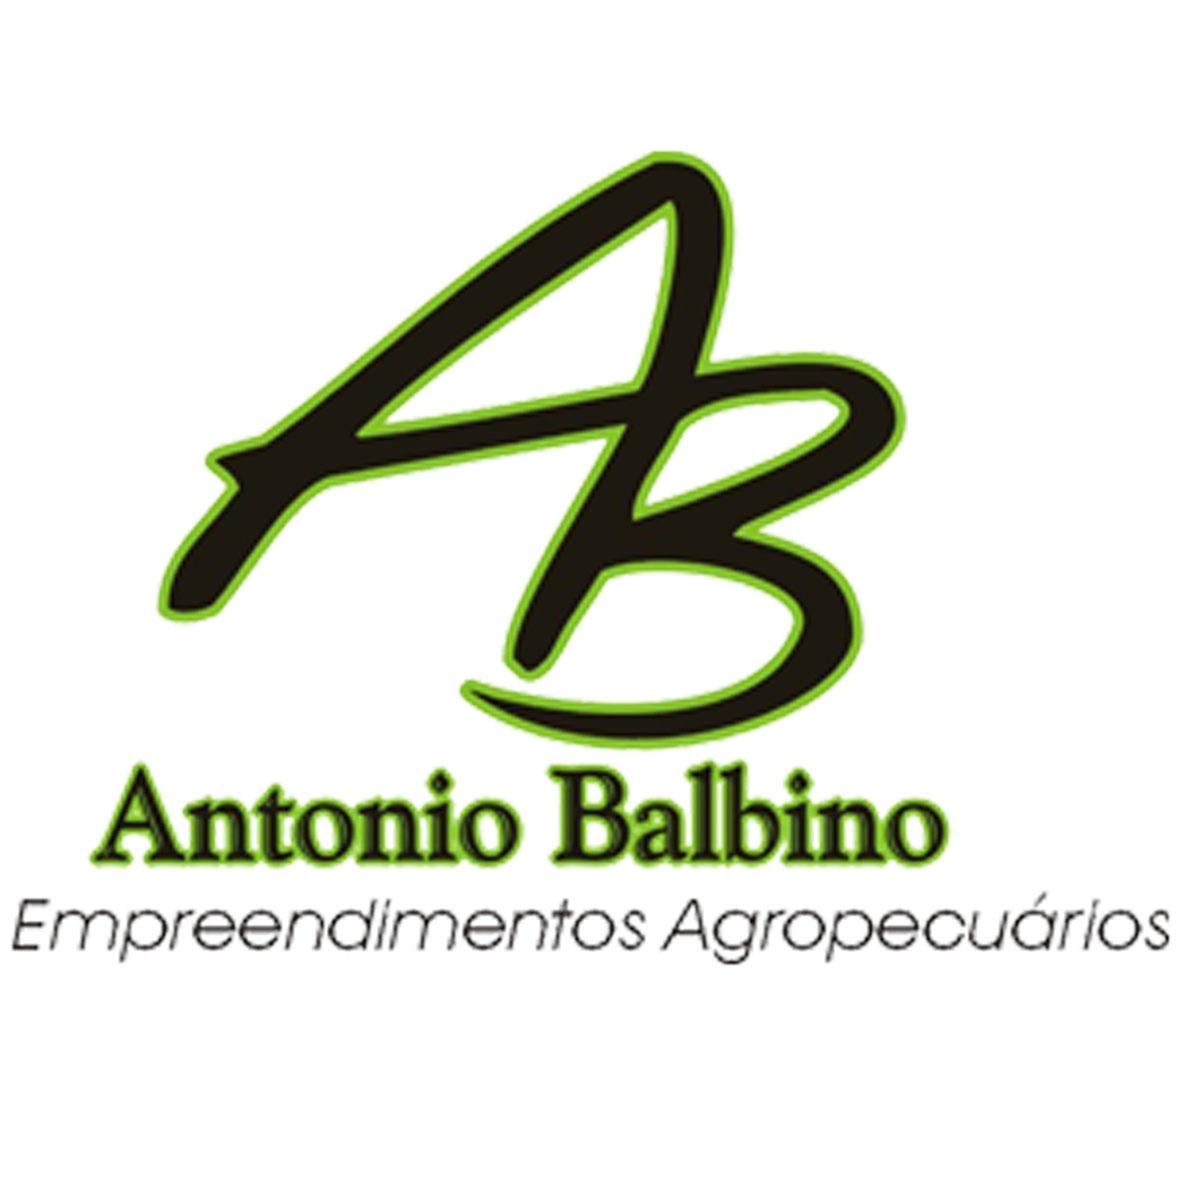 Agropastoril Antônio Balbino